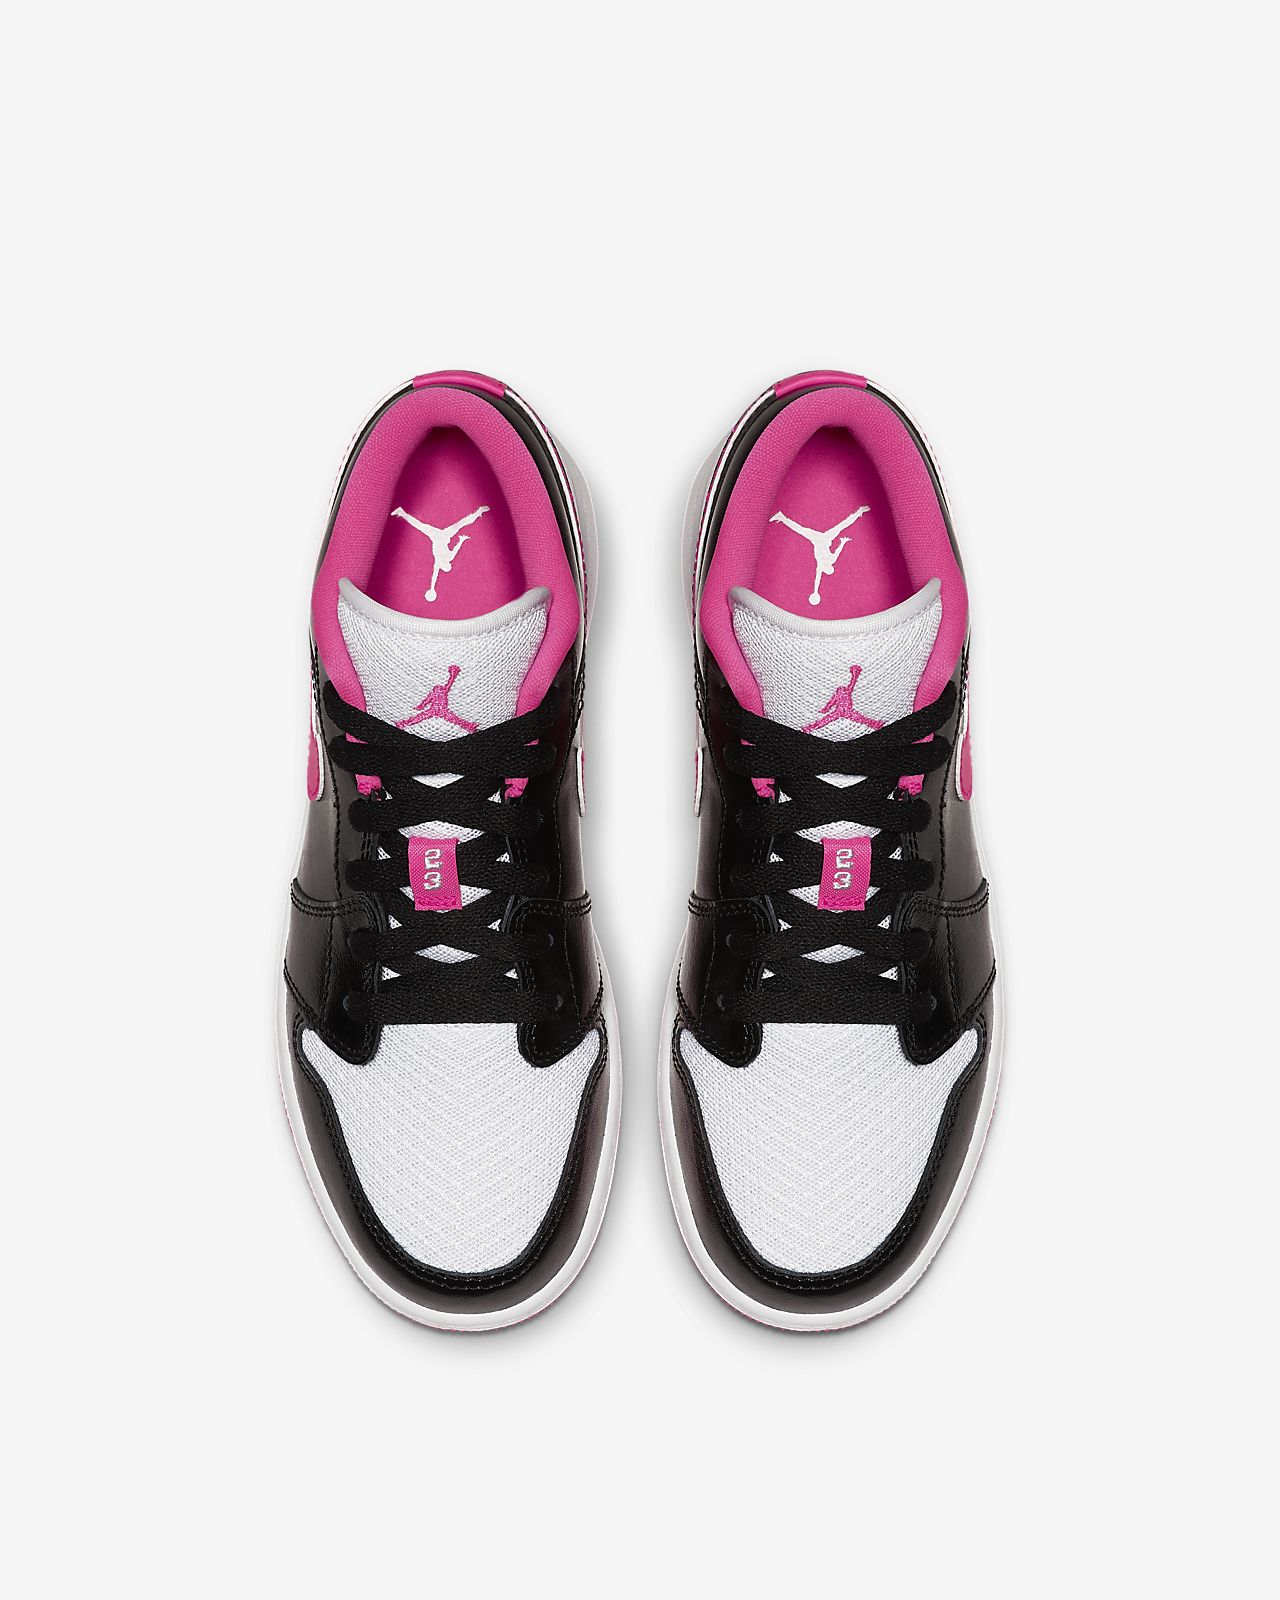 c771486dd31a Air Jordan 1 Low Big Kids  (Girls ) Shoe. Nike.com